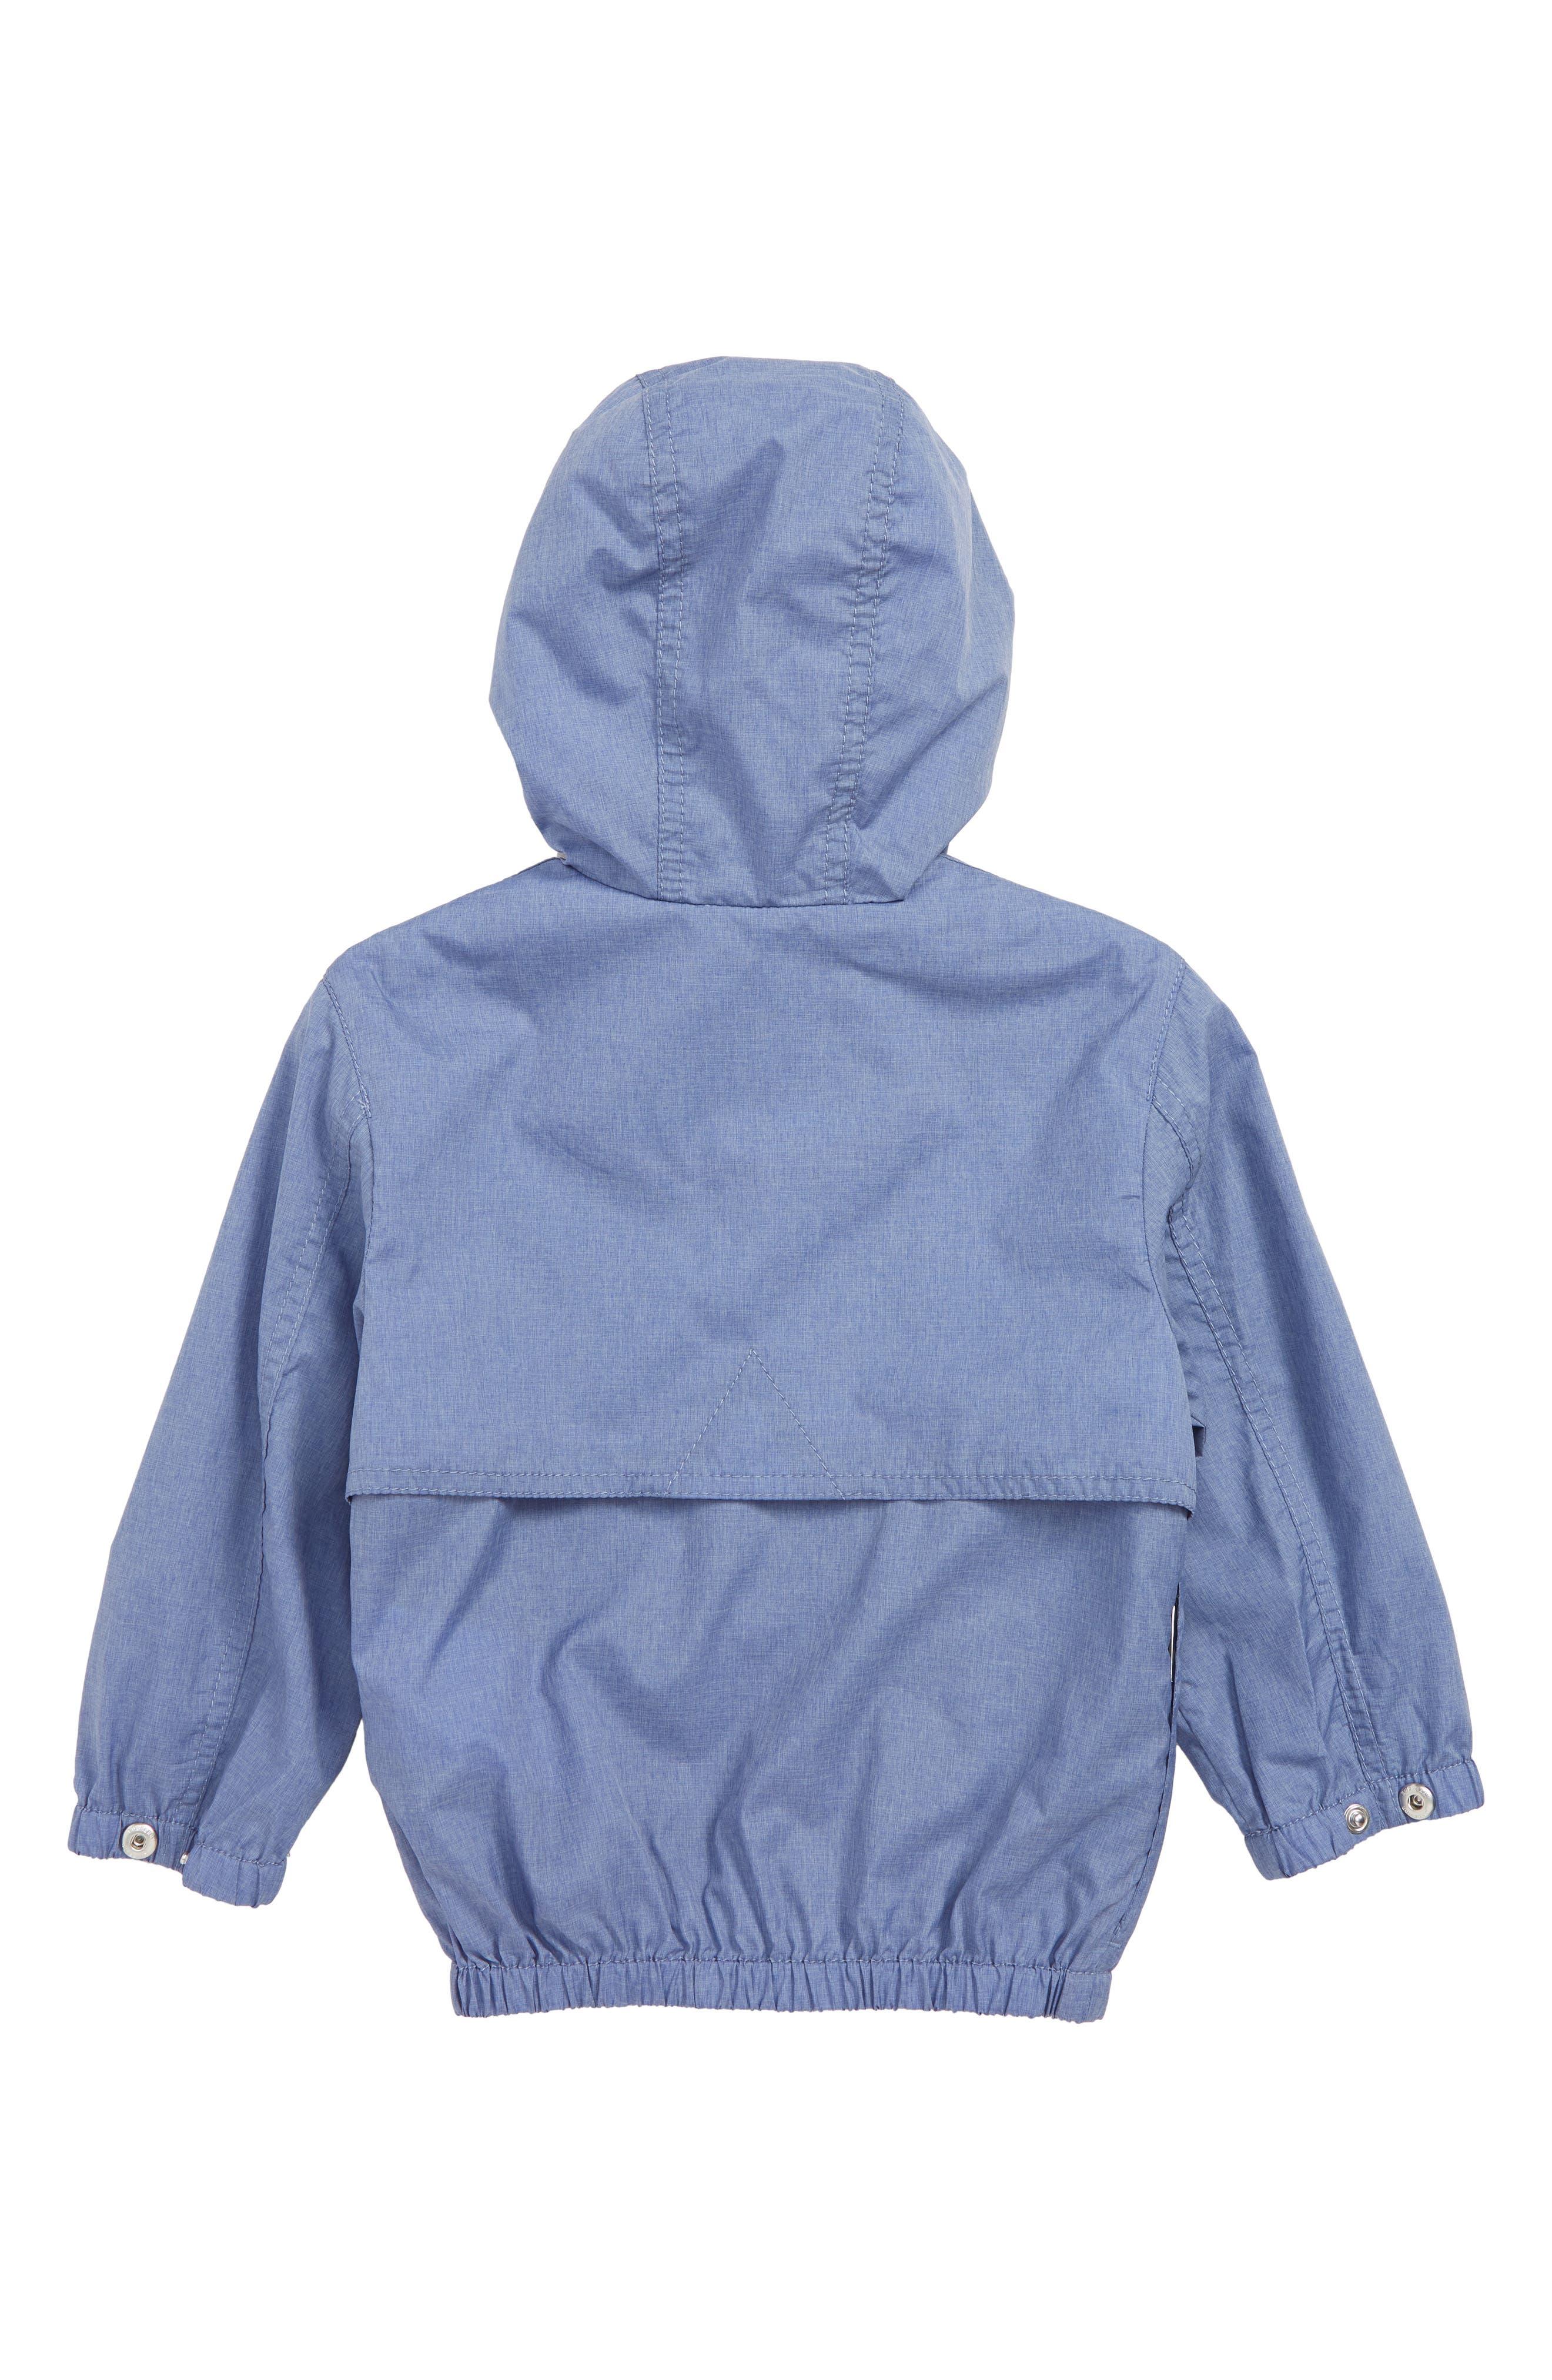 822083e01e5 Coats   Jackets Burberry for Baby  Clothing